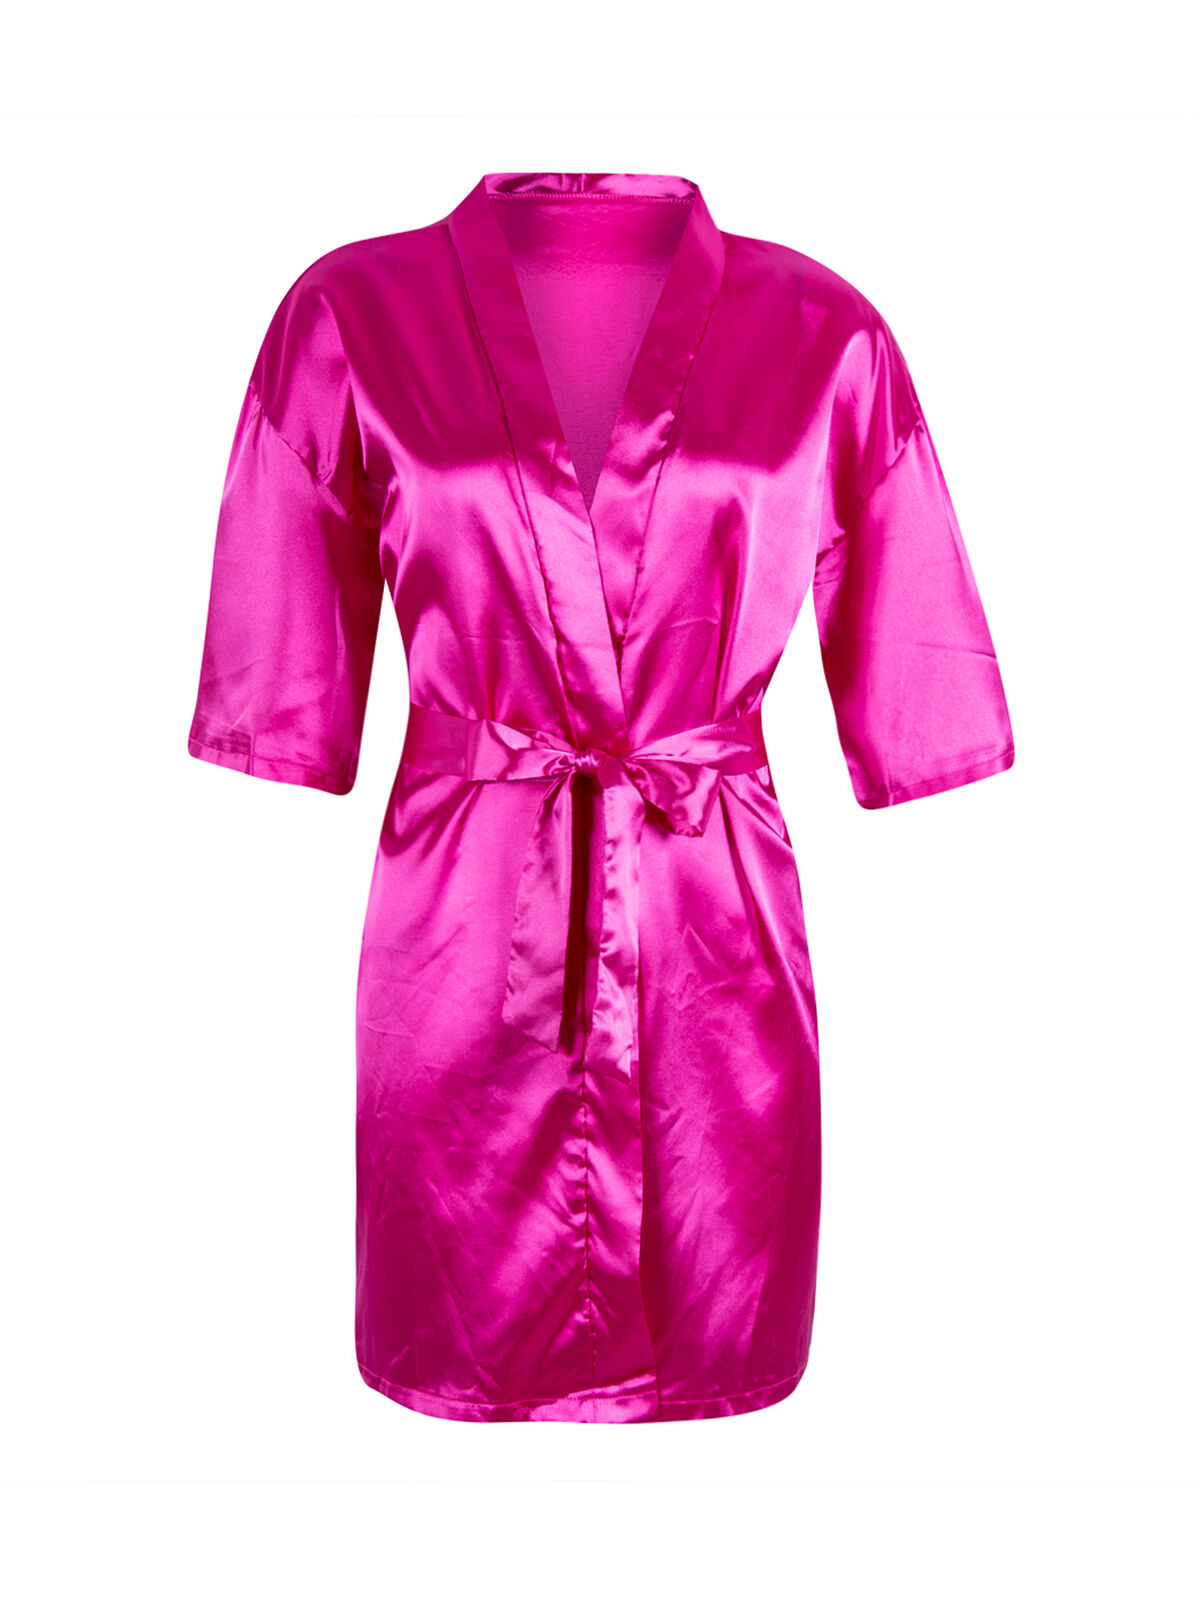 New Design Women/'s Lone Sleeve Fashion Design Satin Dress with Belt